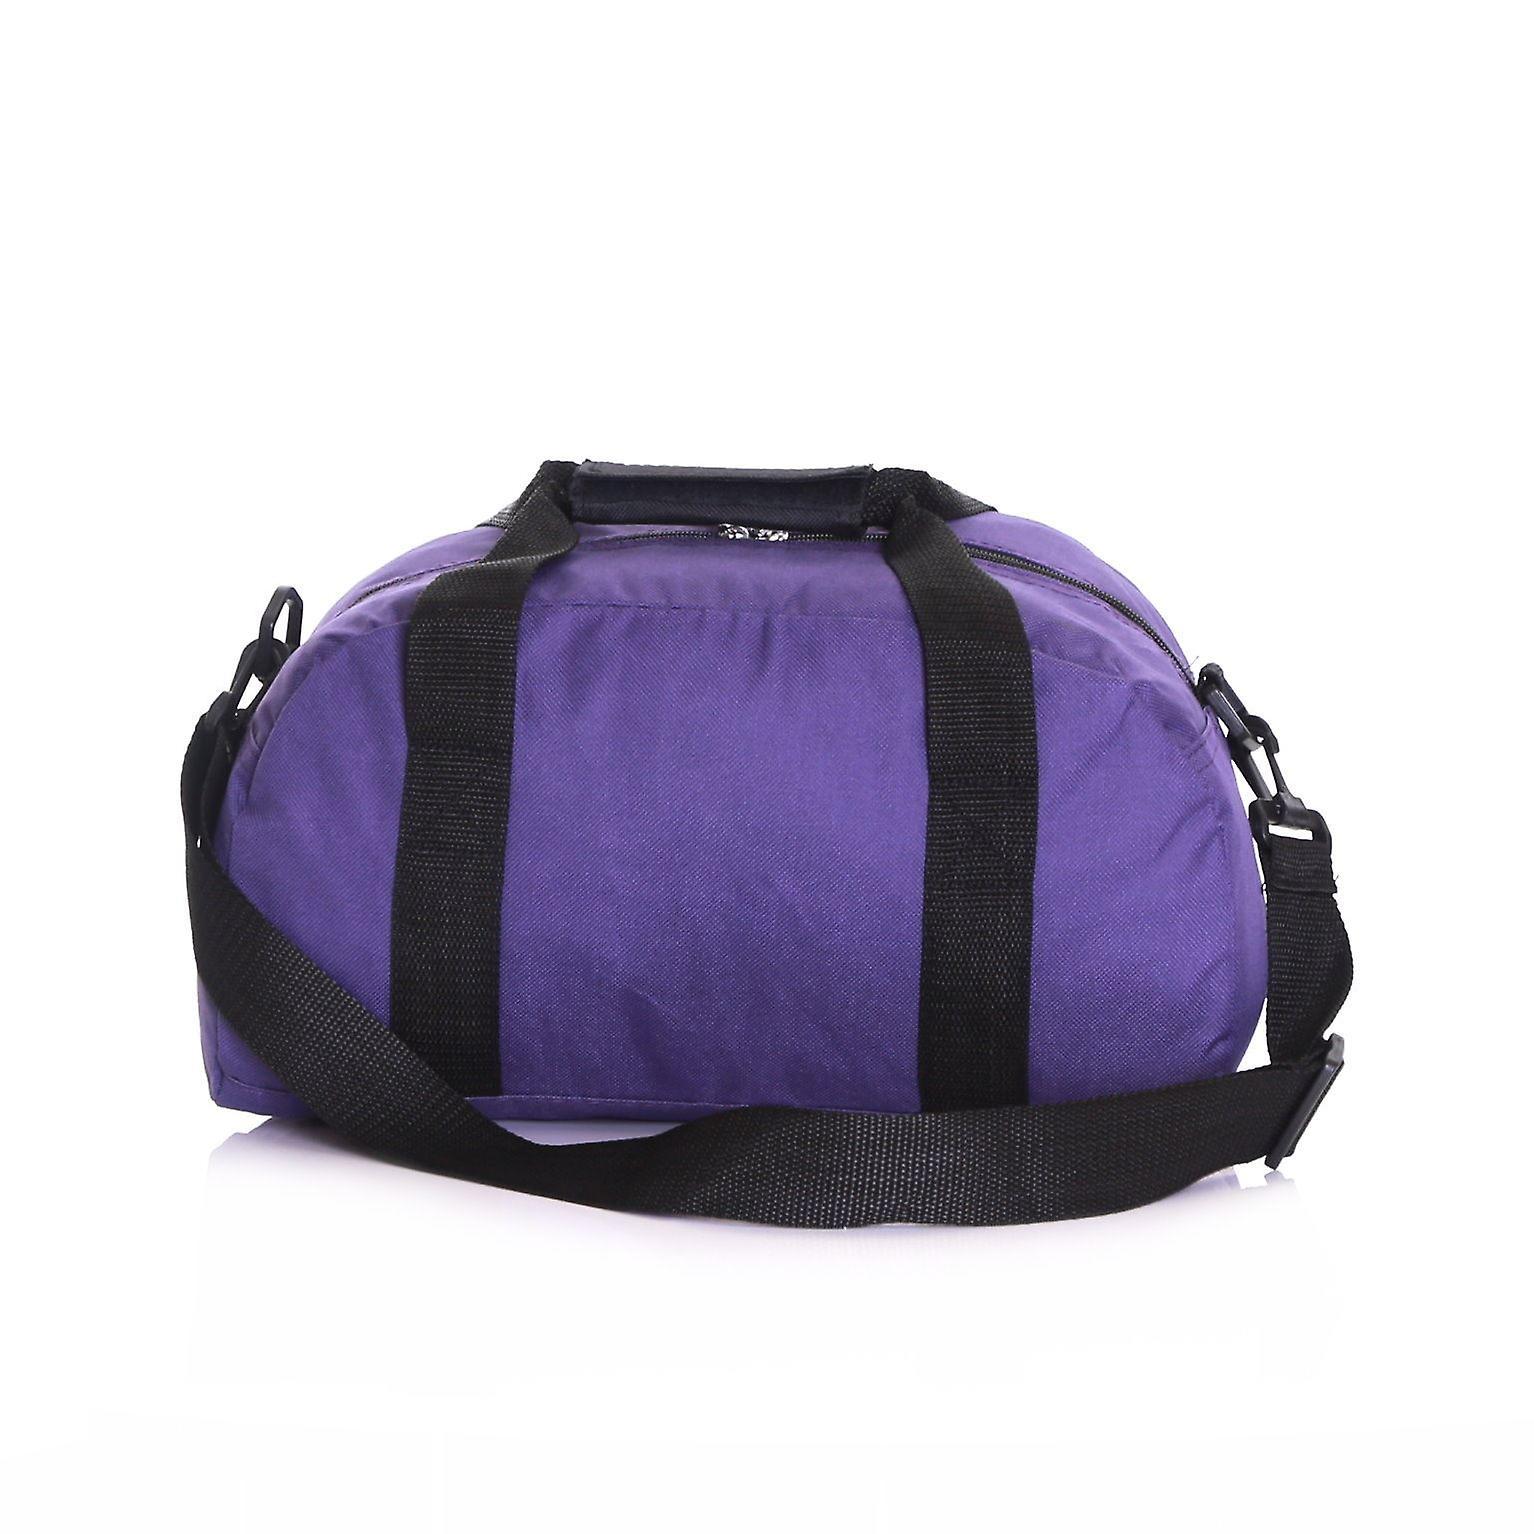 Slimbridge Ryanair Set of 2 Cabin Bags, Purple 55 x 40 x 20 cm and 35 x 20 x 20 cm